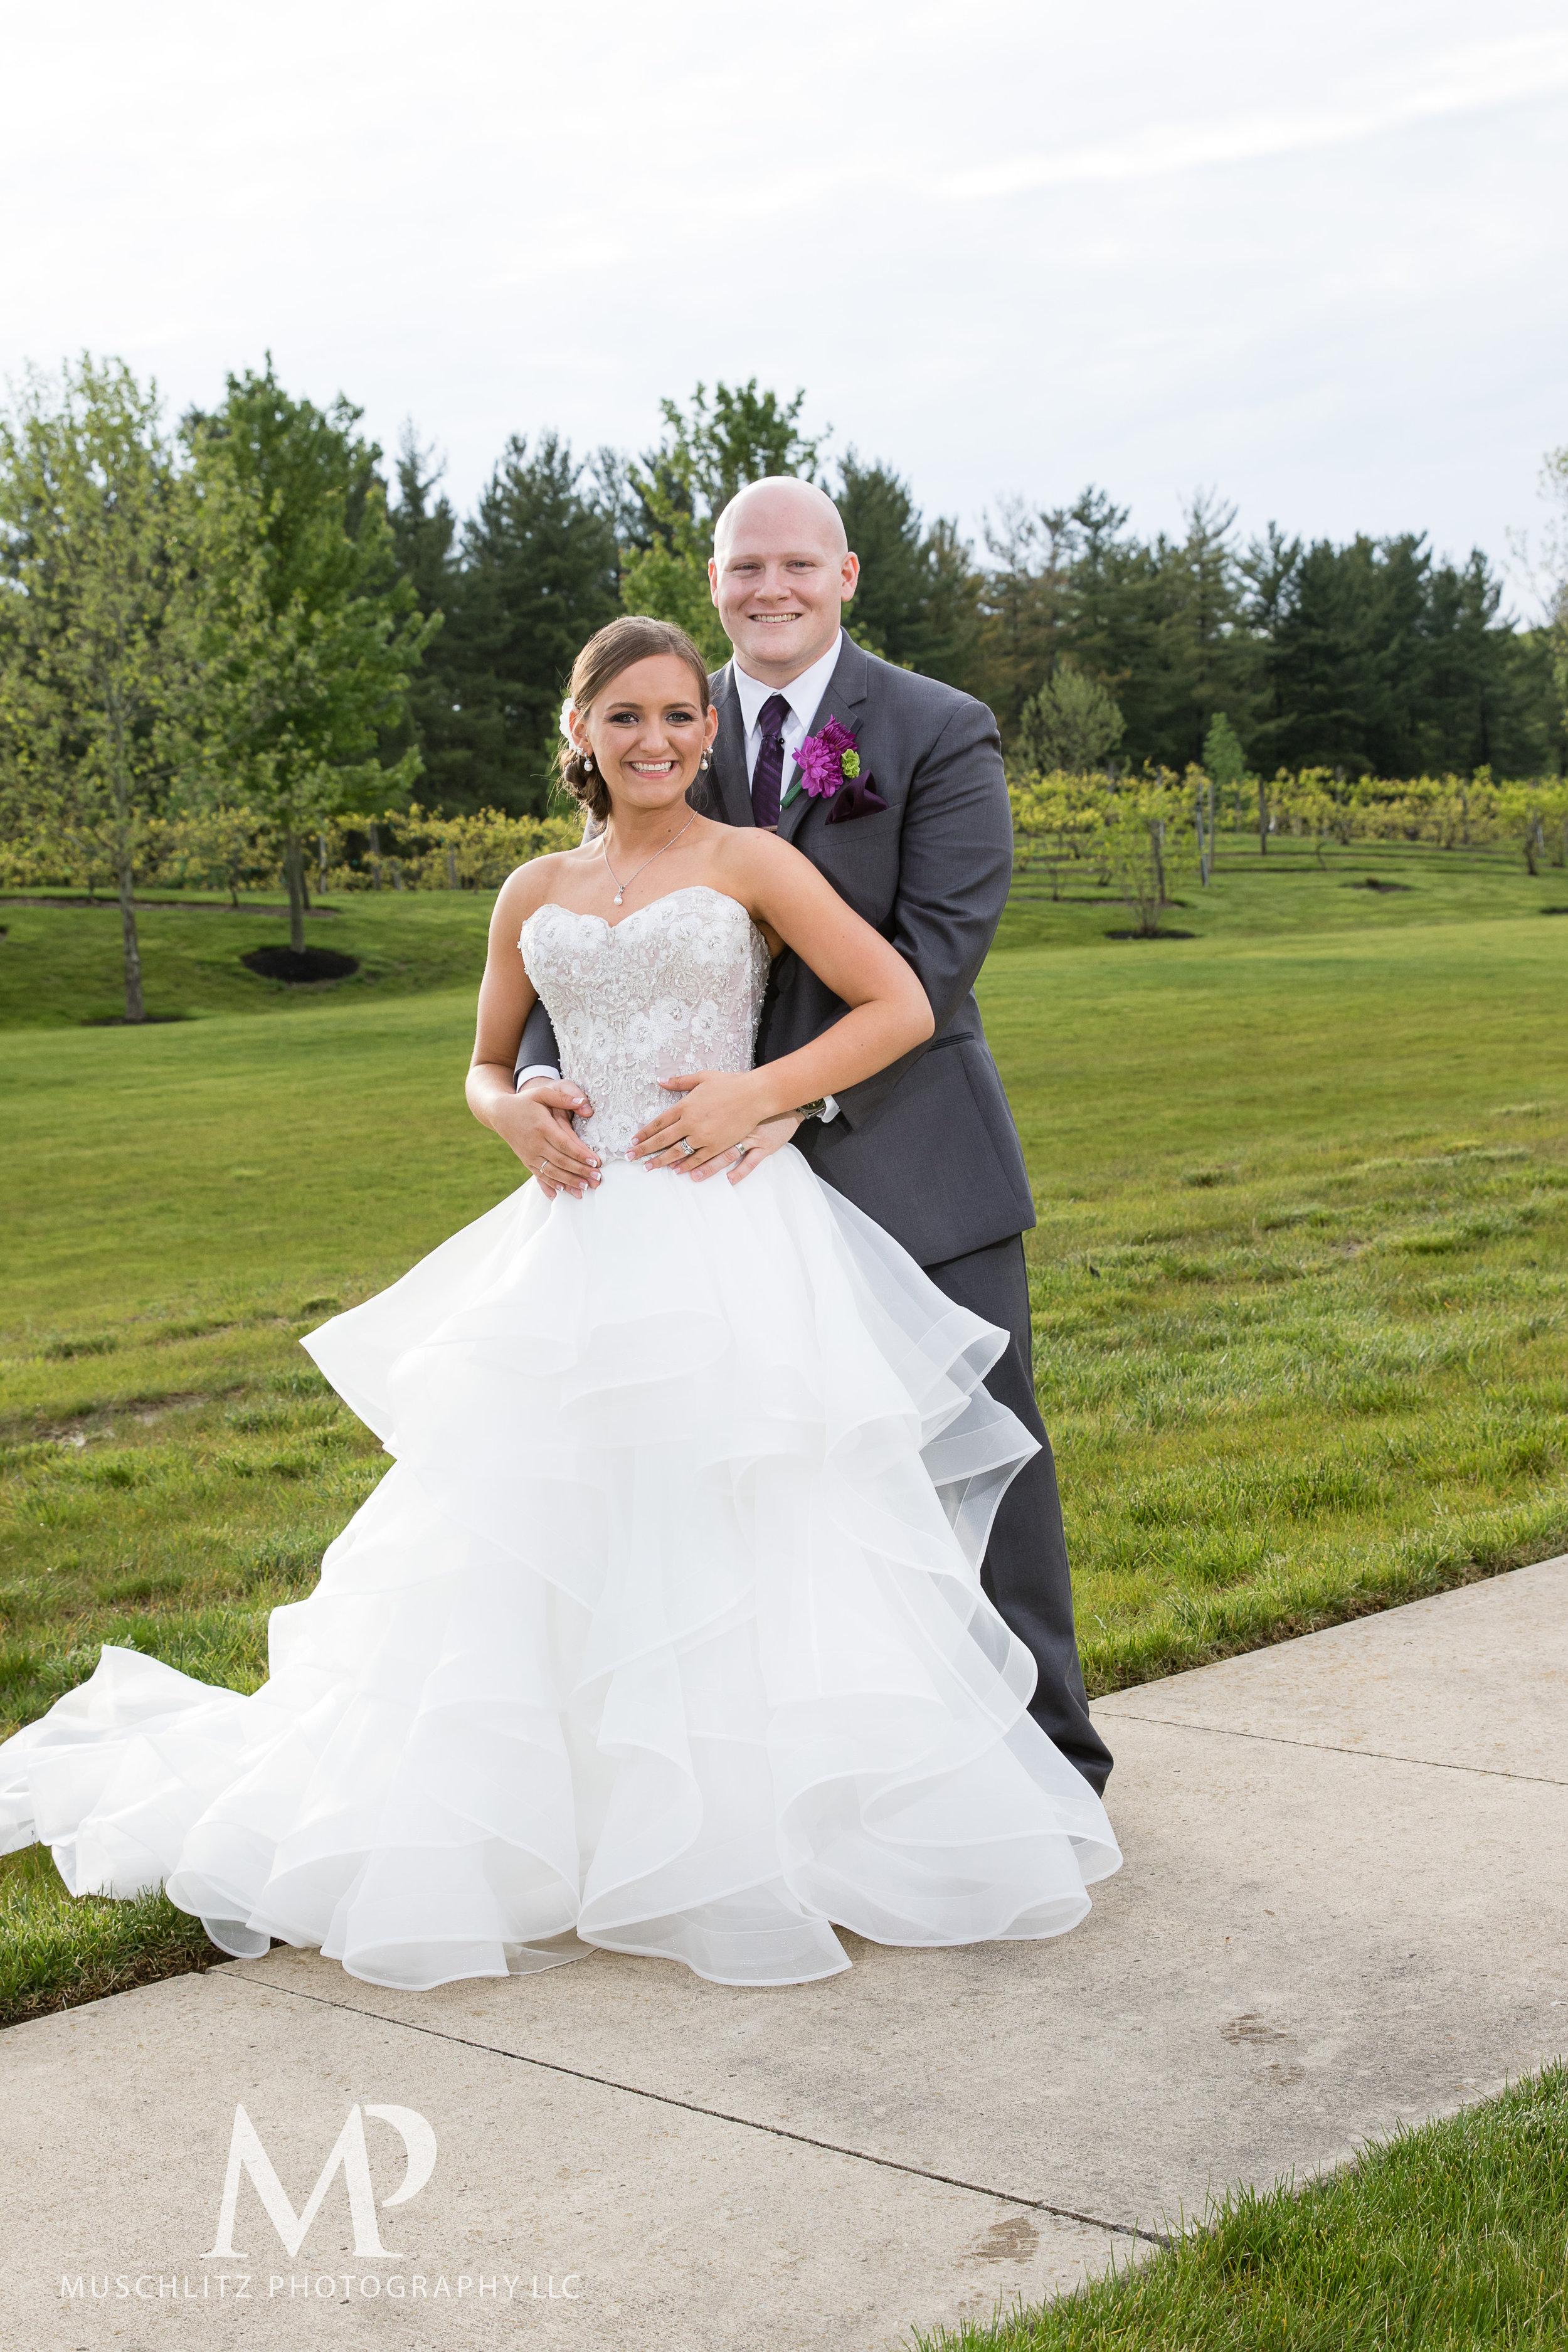 club-at-corazon-wedding-ceremony-reception-columbus-dublin-ohio-ohio-university-theme-056.JPG